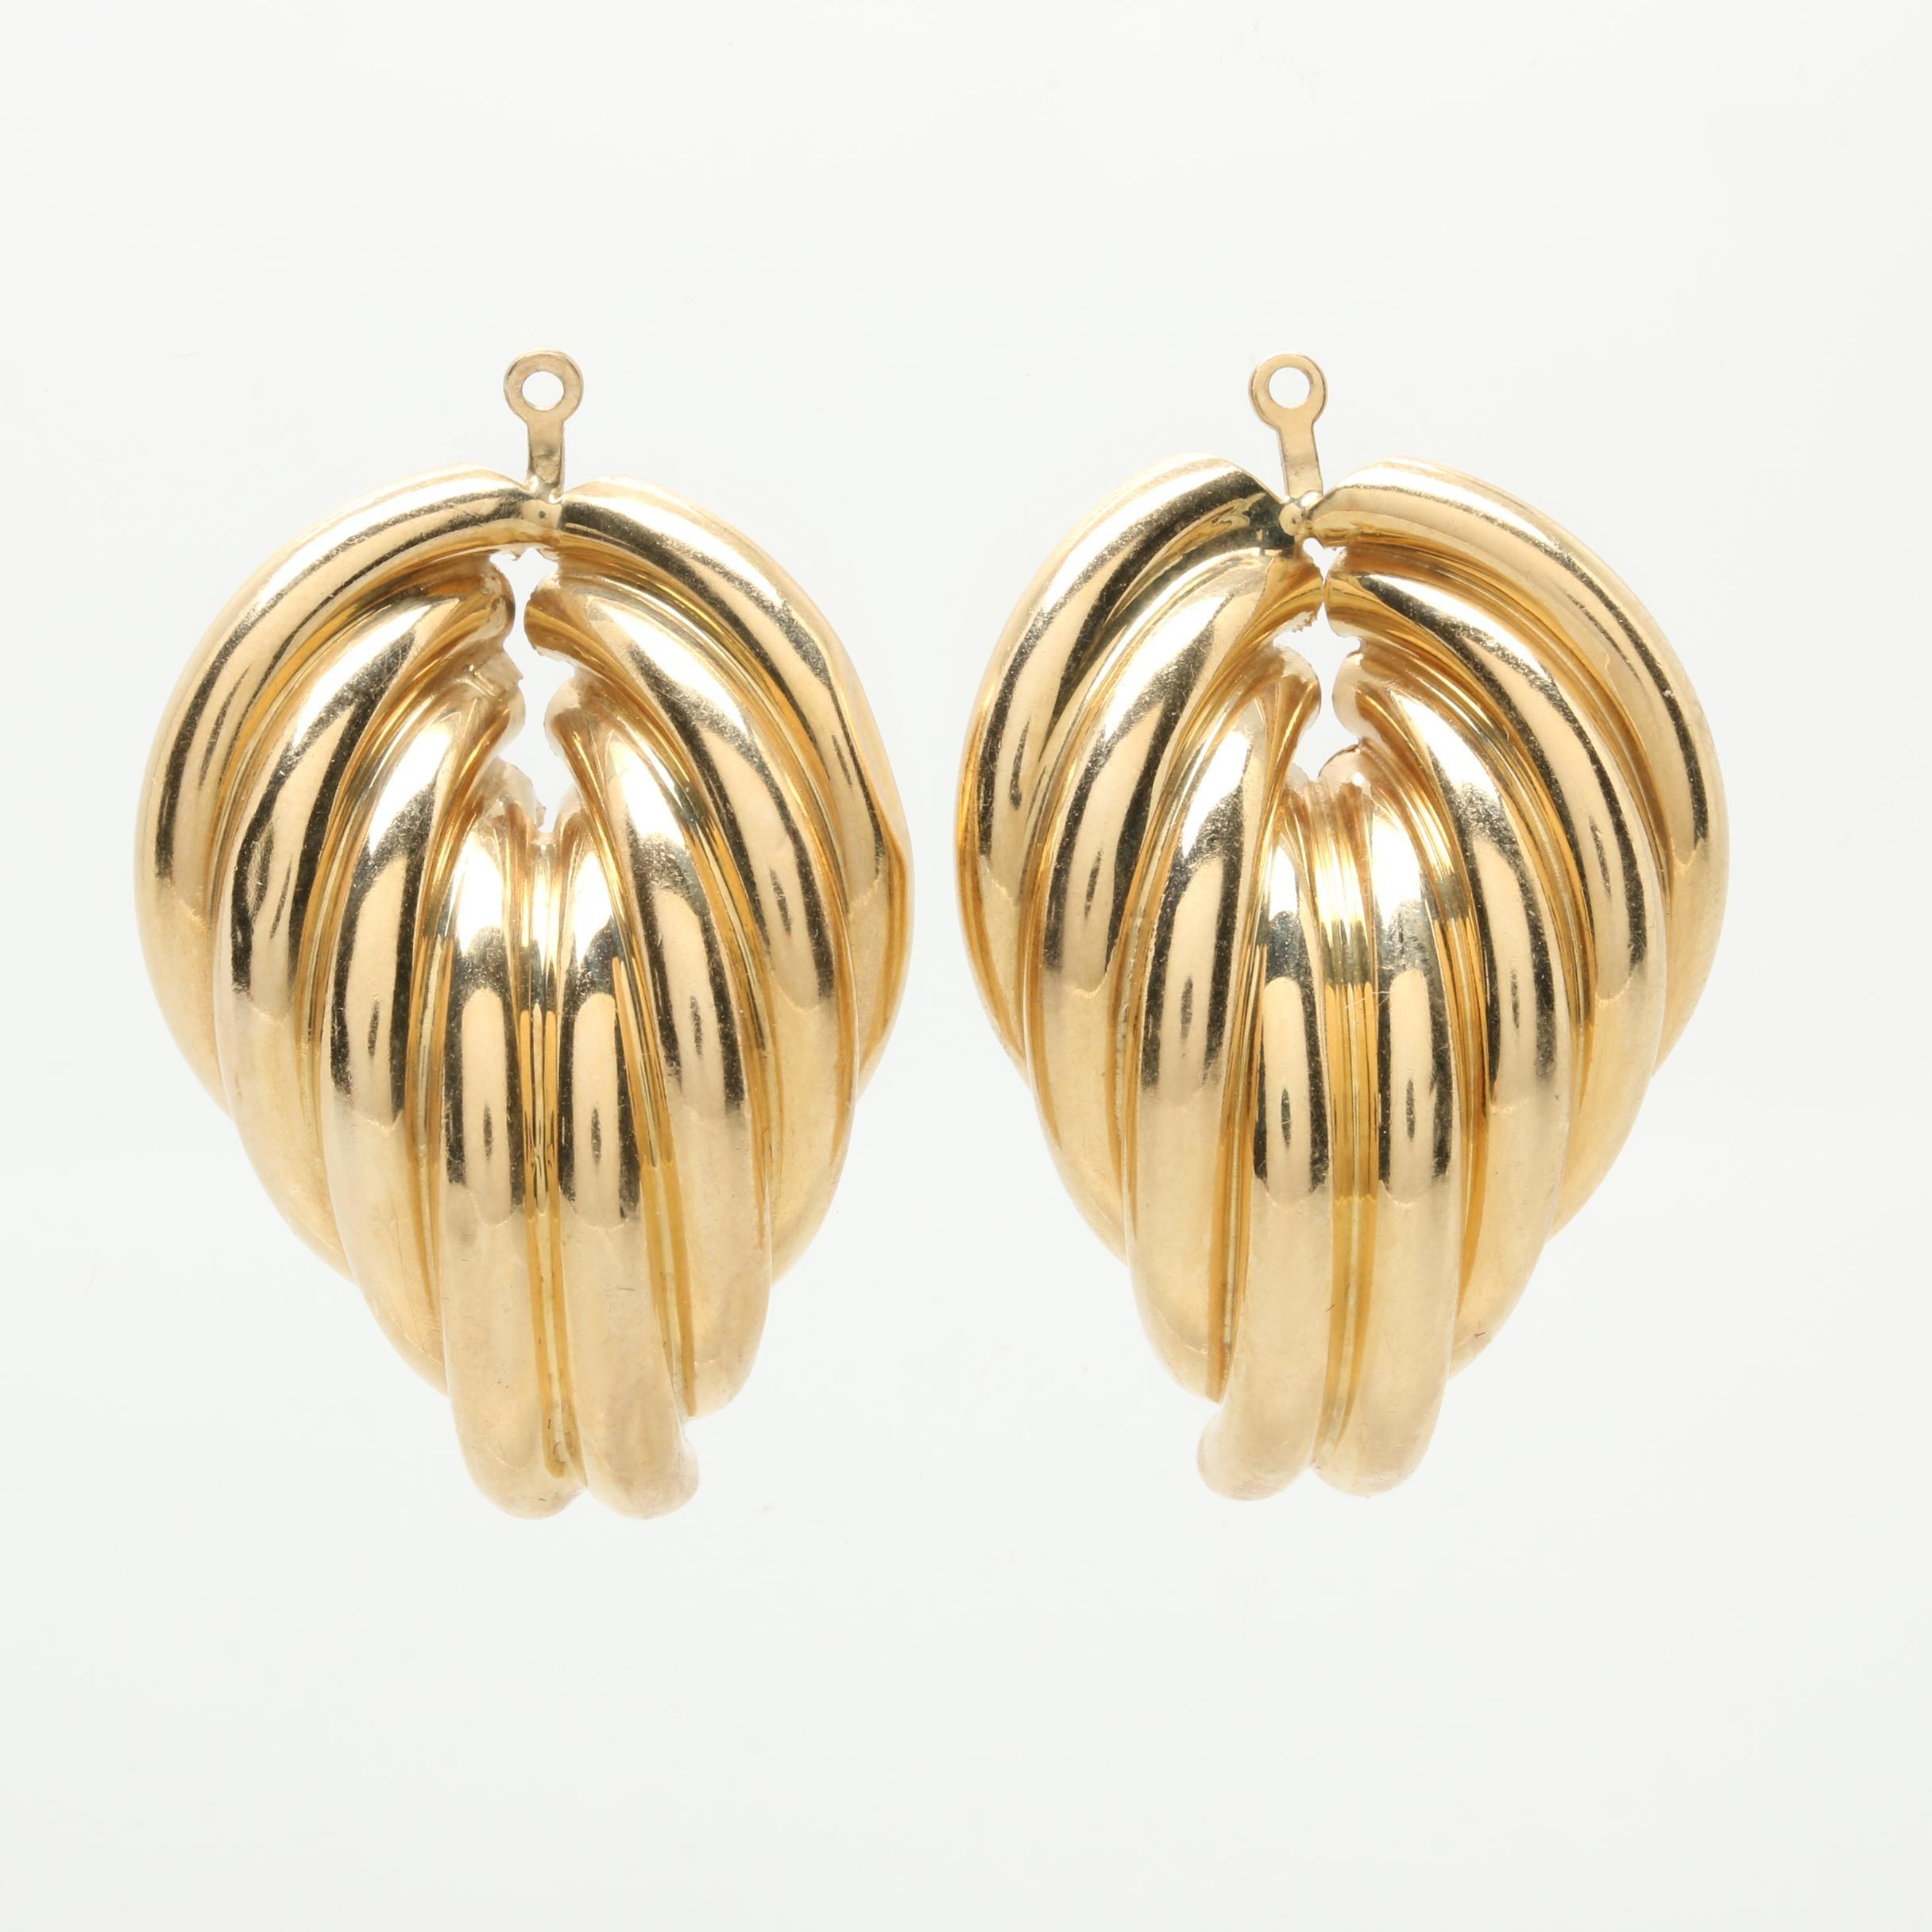 14K Yellow Gold Geometric Cluster Earring Jackets